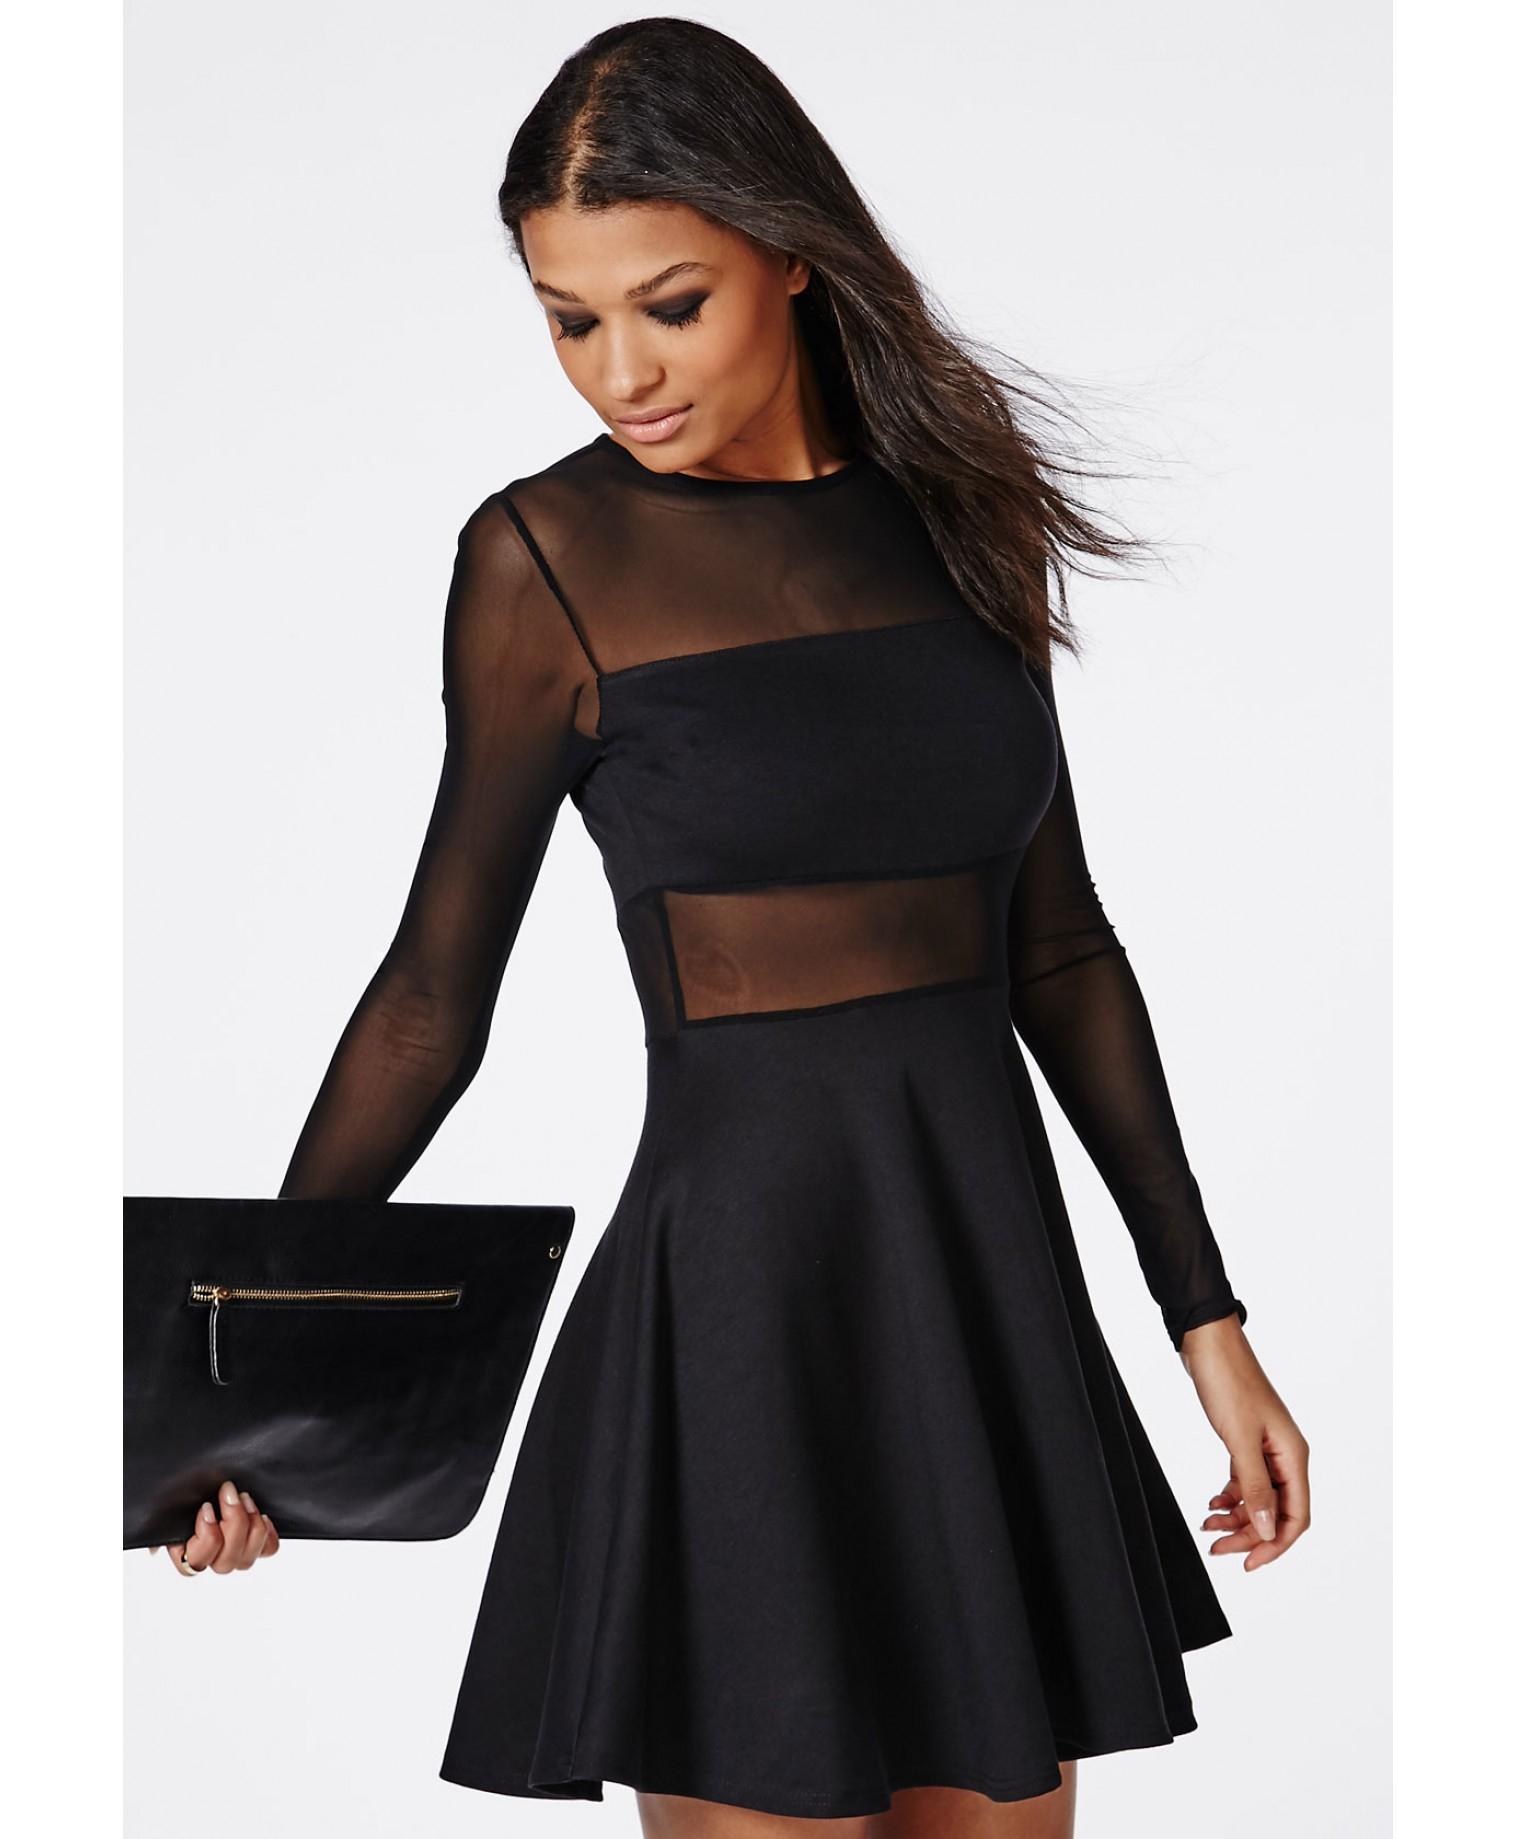 long sleeve mesh dress in black « Bella Forte Glass Studio